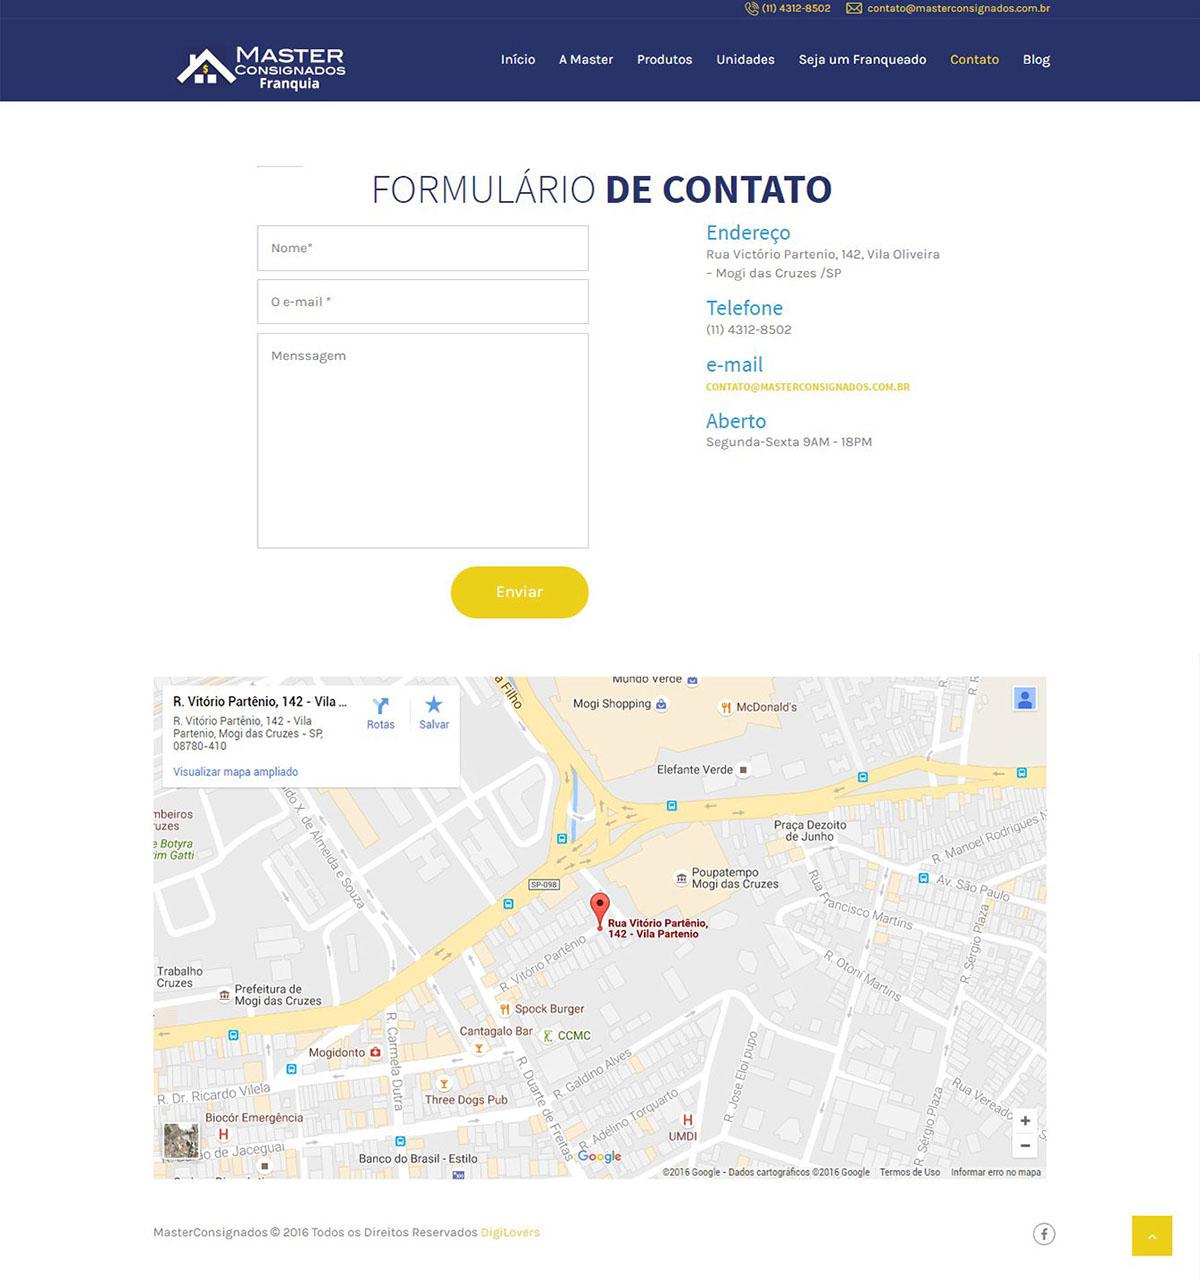 Website Master Consignados